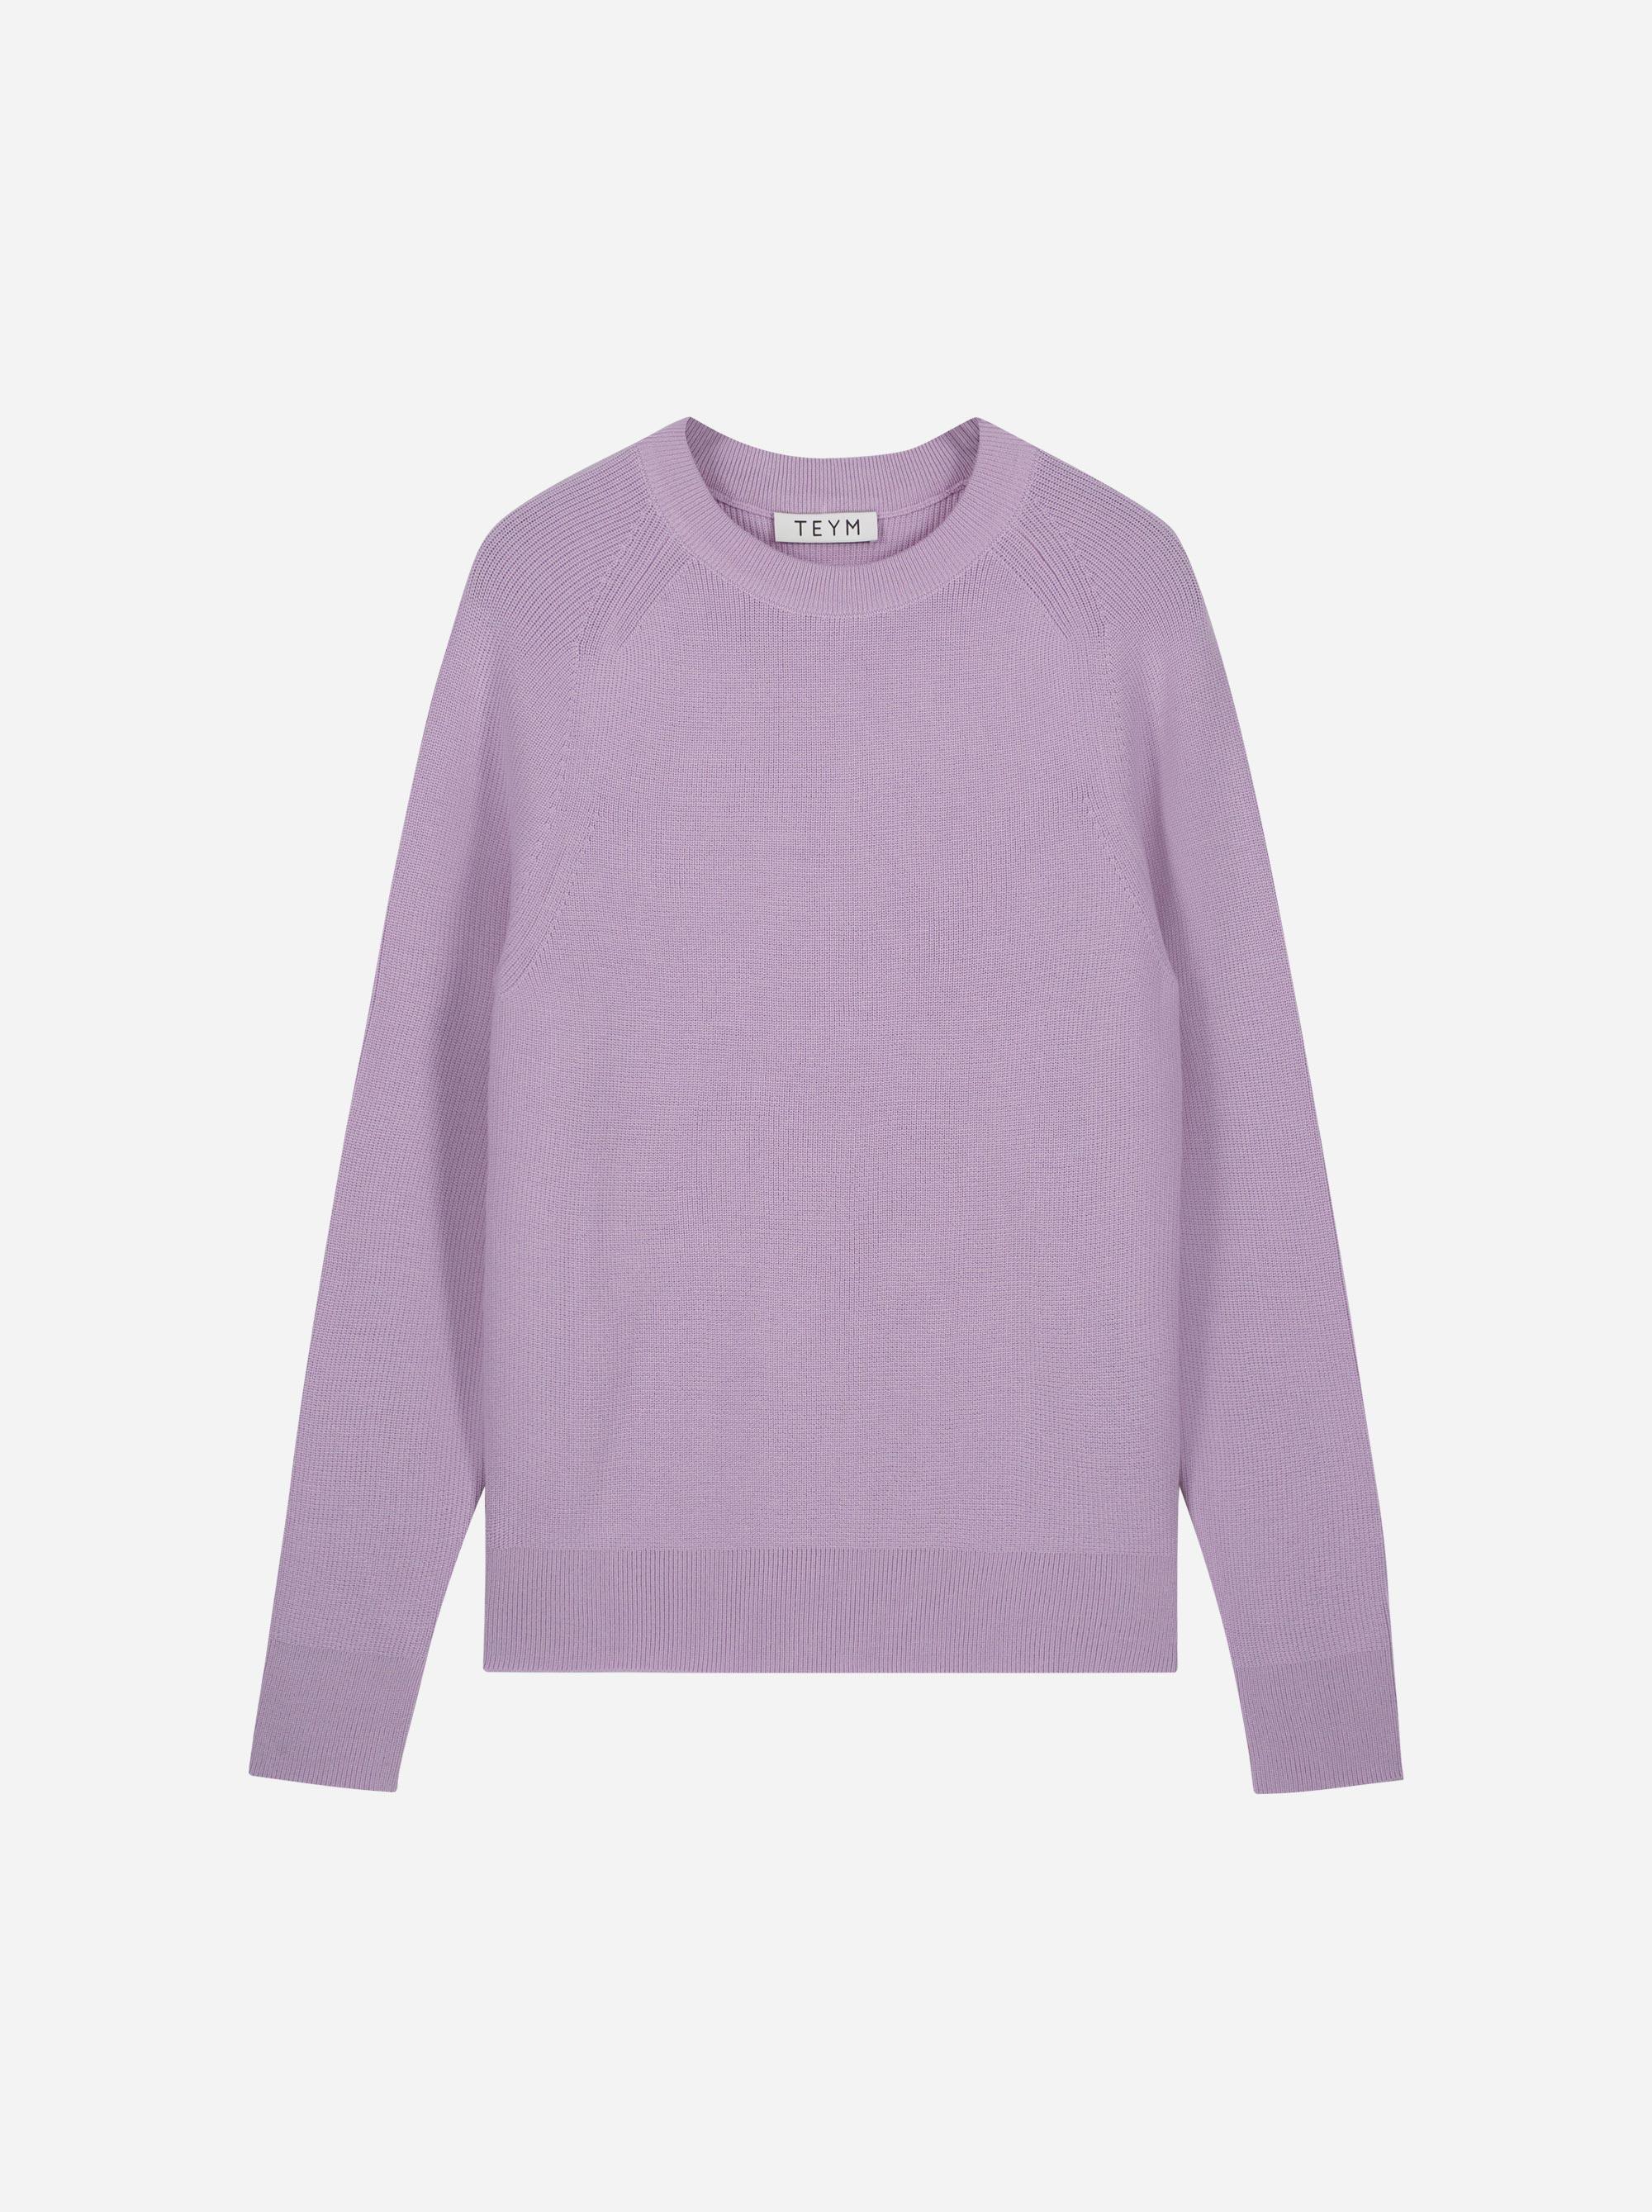 Teym_Merino-Sweater-Crewneck_lila_front_1